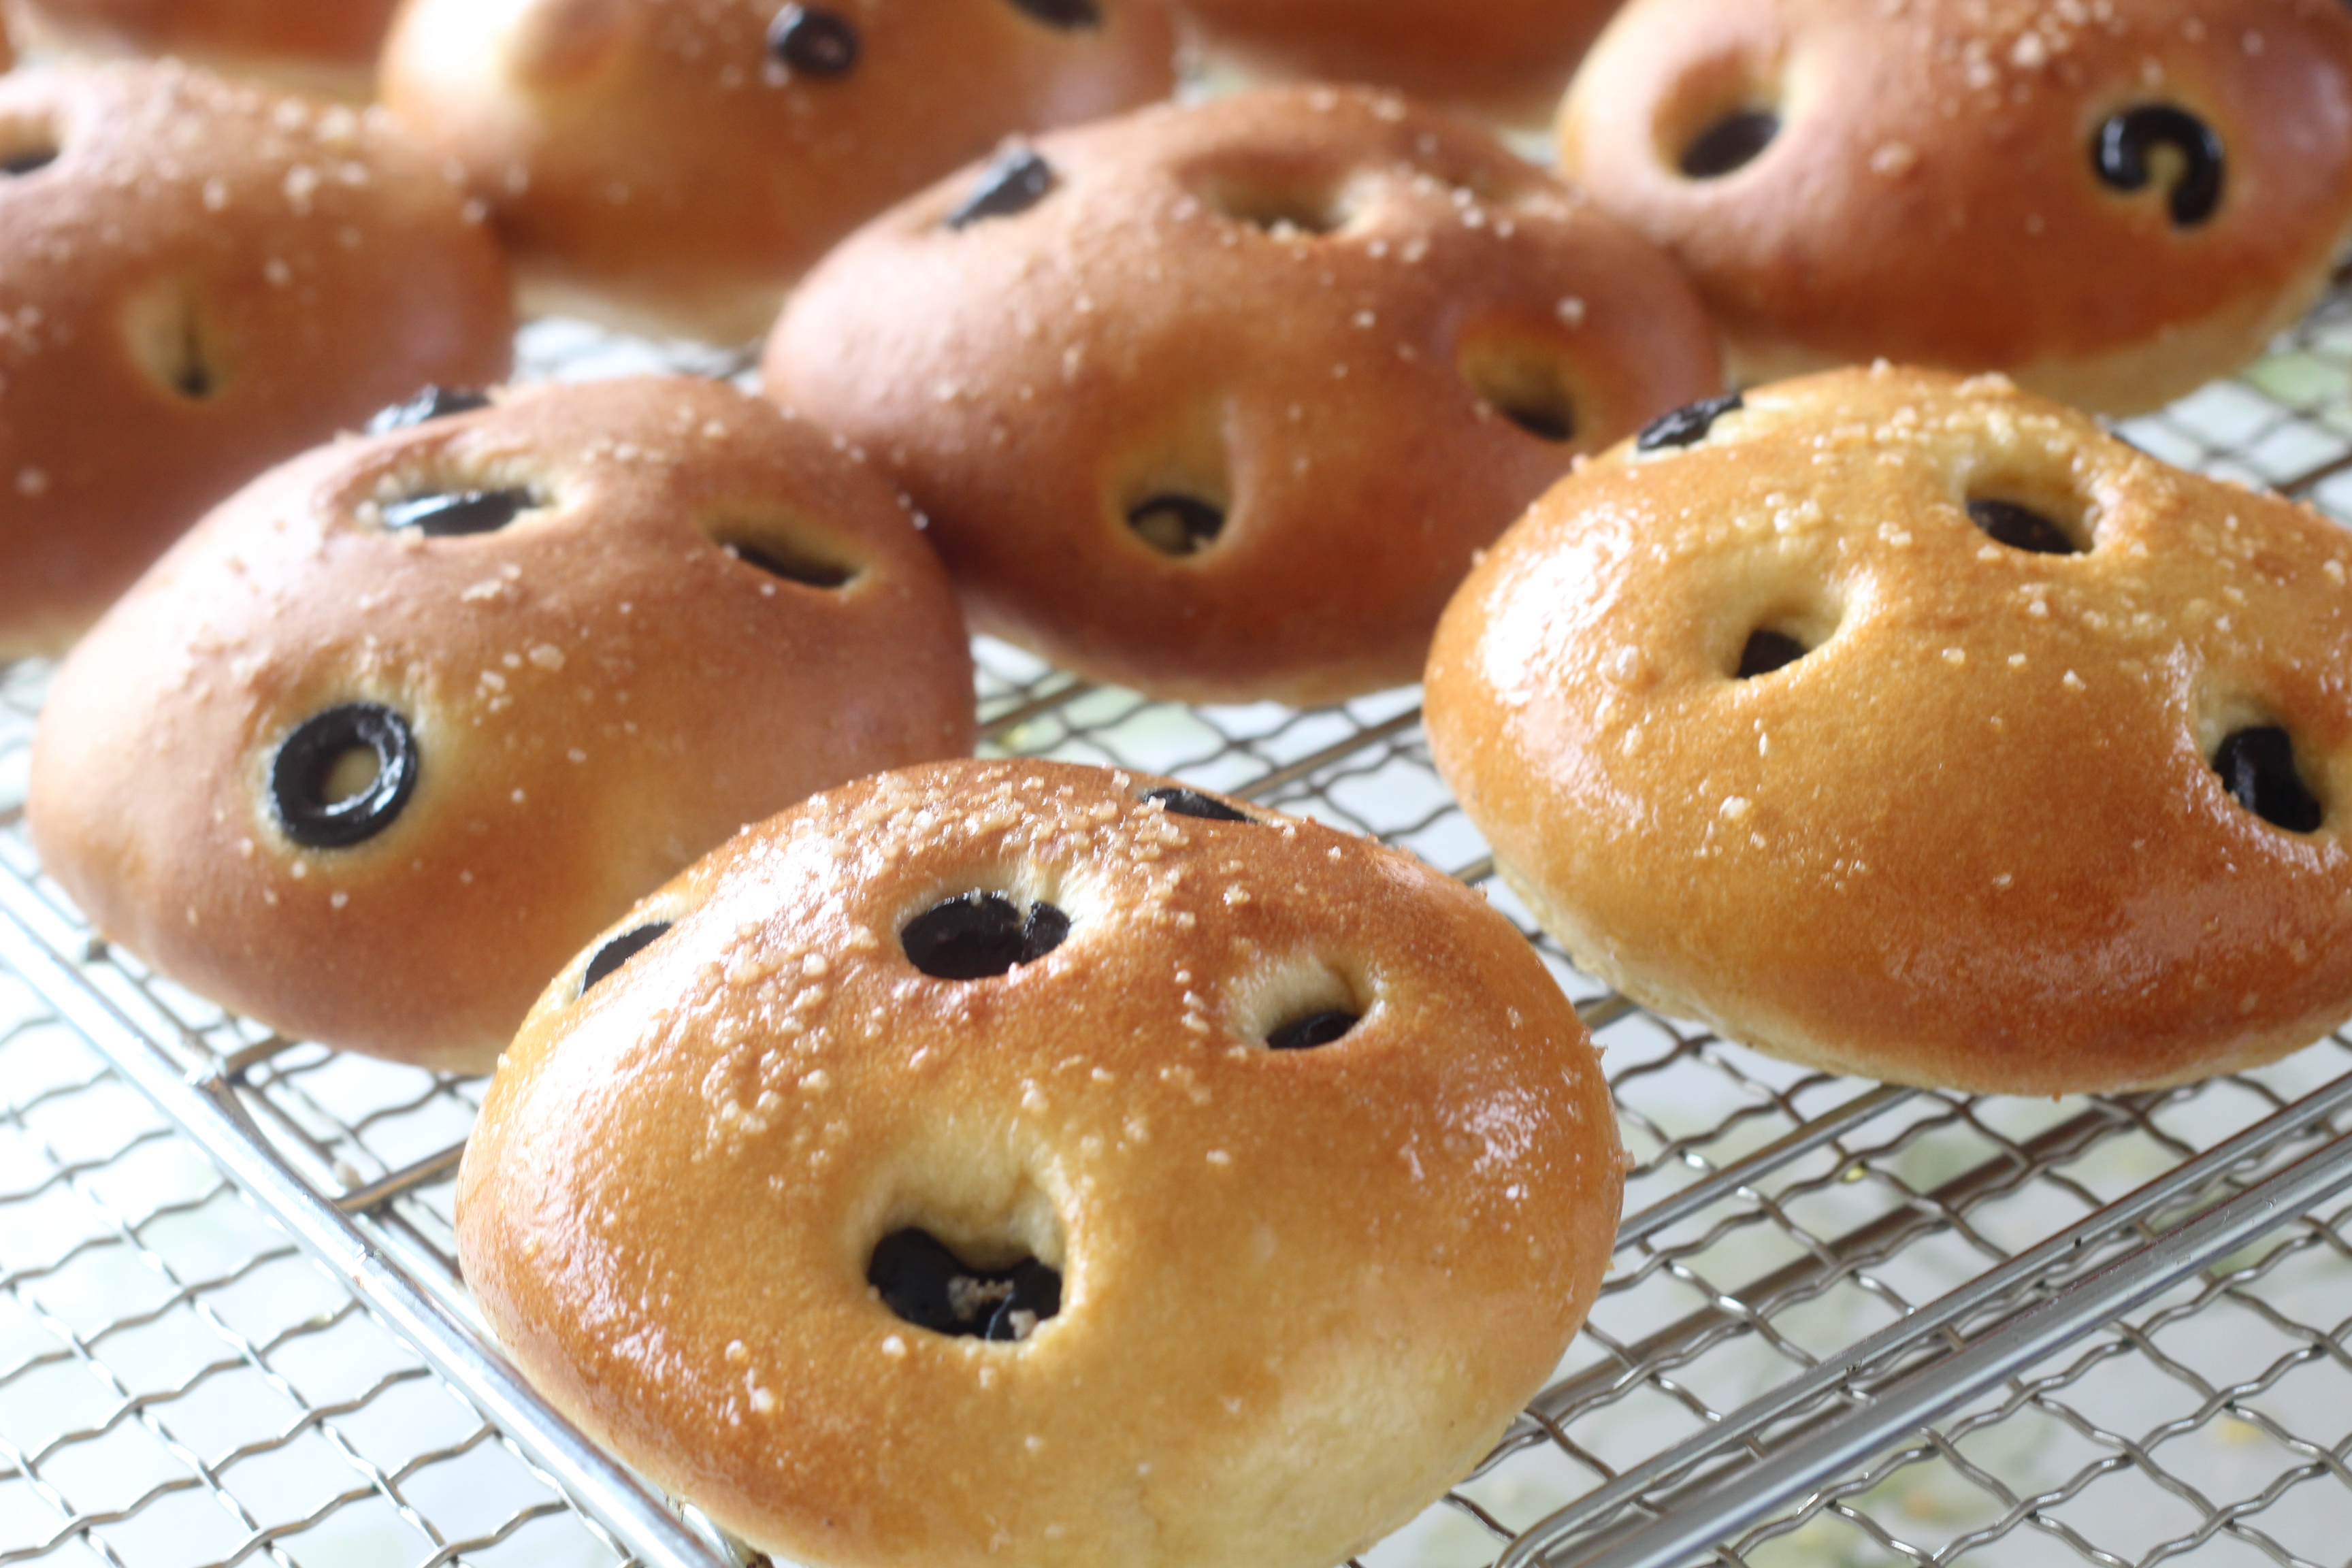 a-ta-sante糖質制限パン料理教室、阿倍野区西田辺。京都江部粉アドバンスくーす『フォカッチャ&クロワッサン』